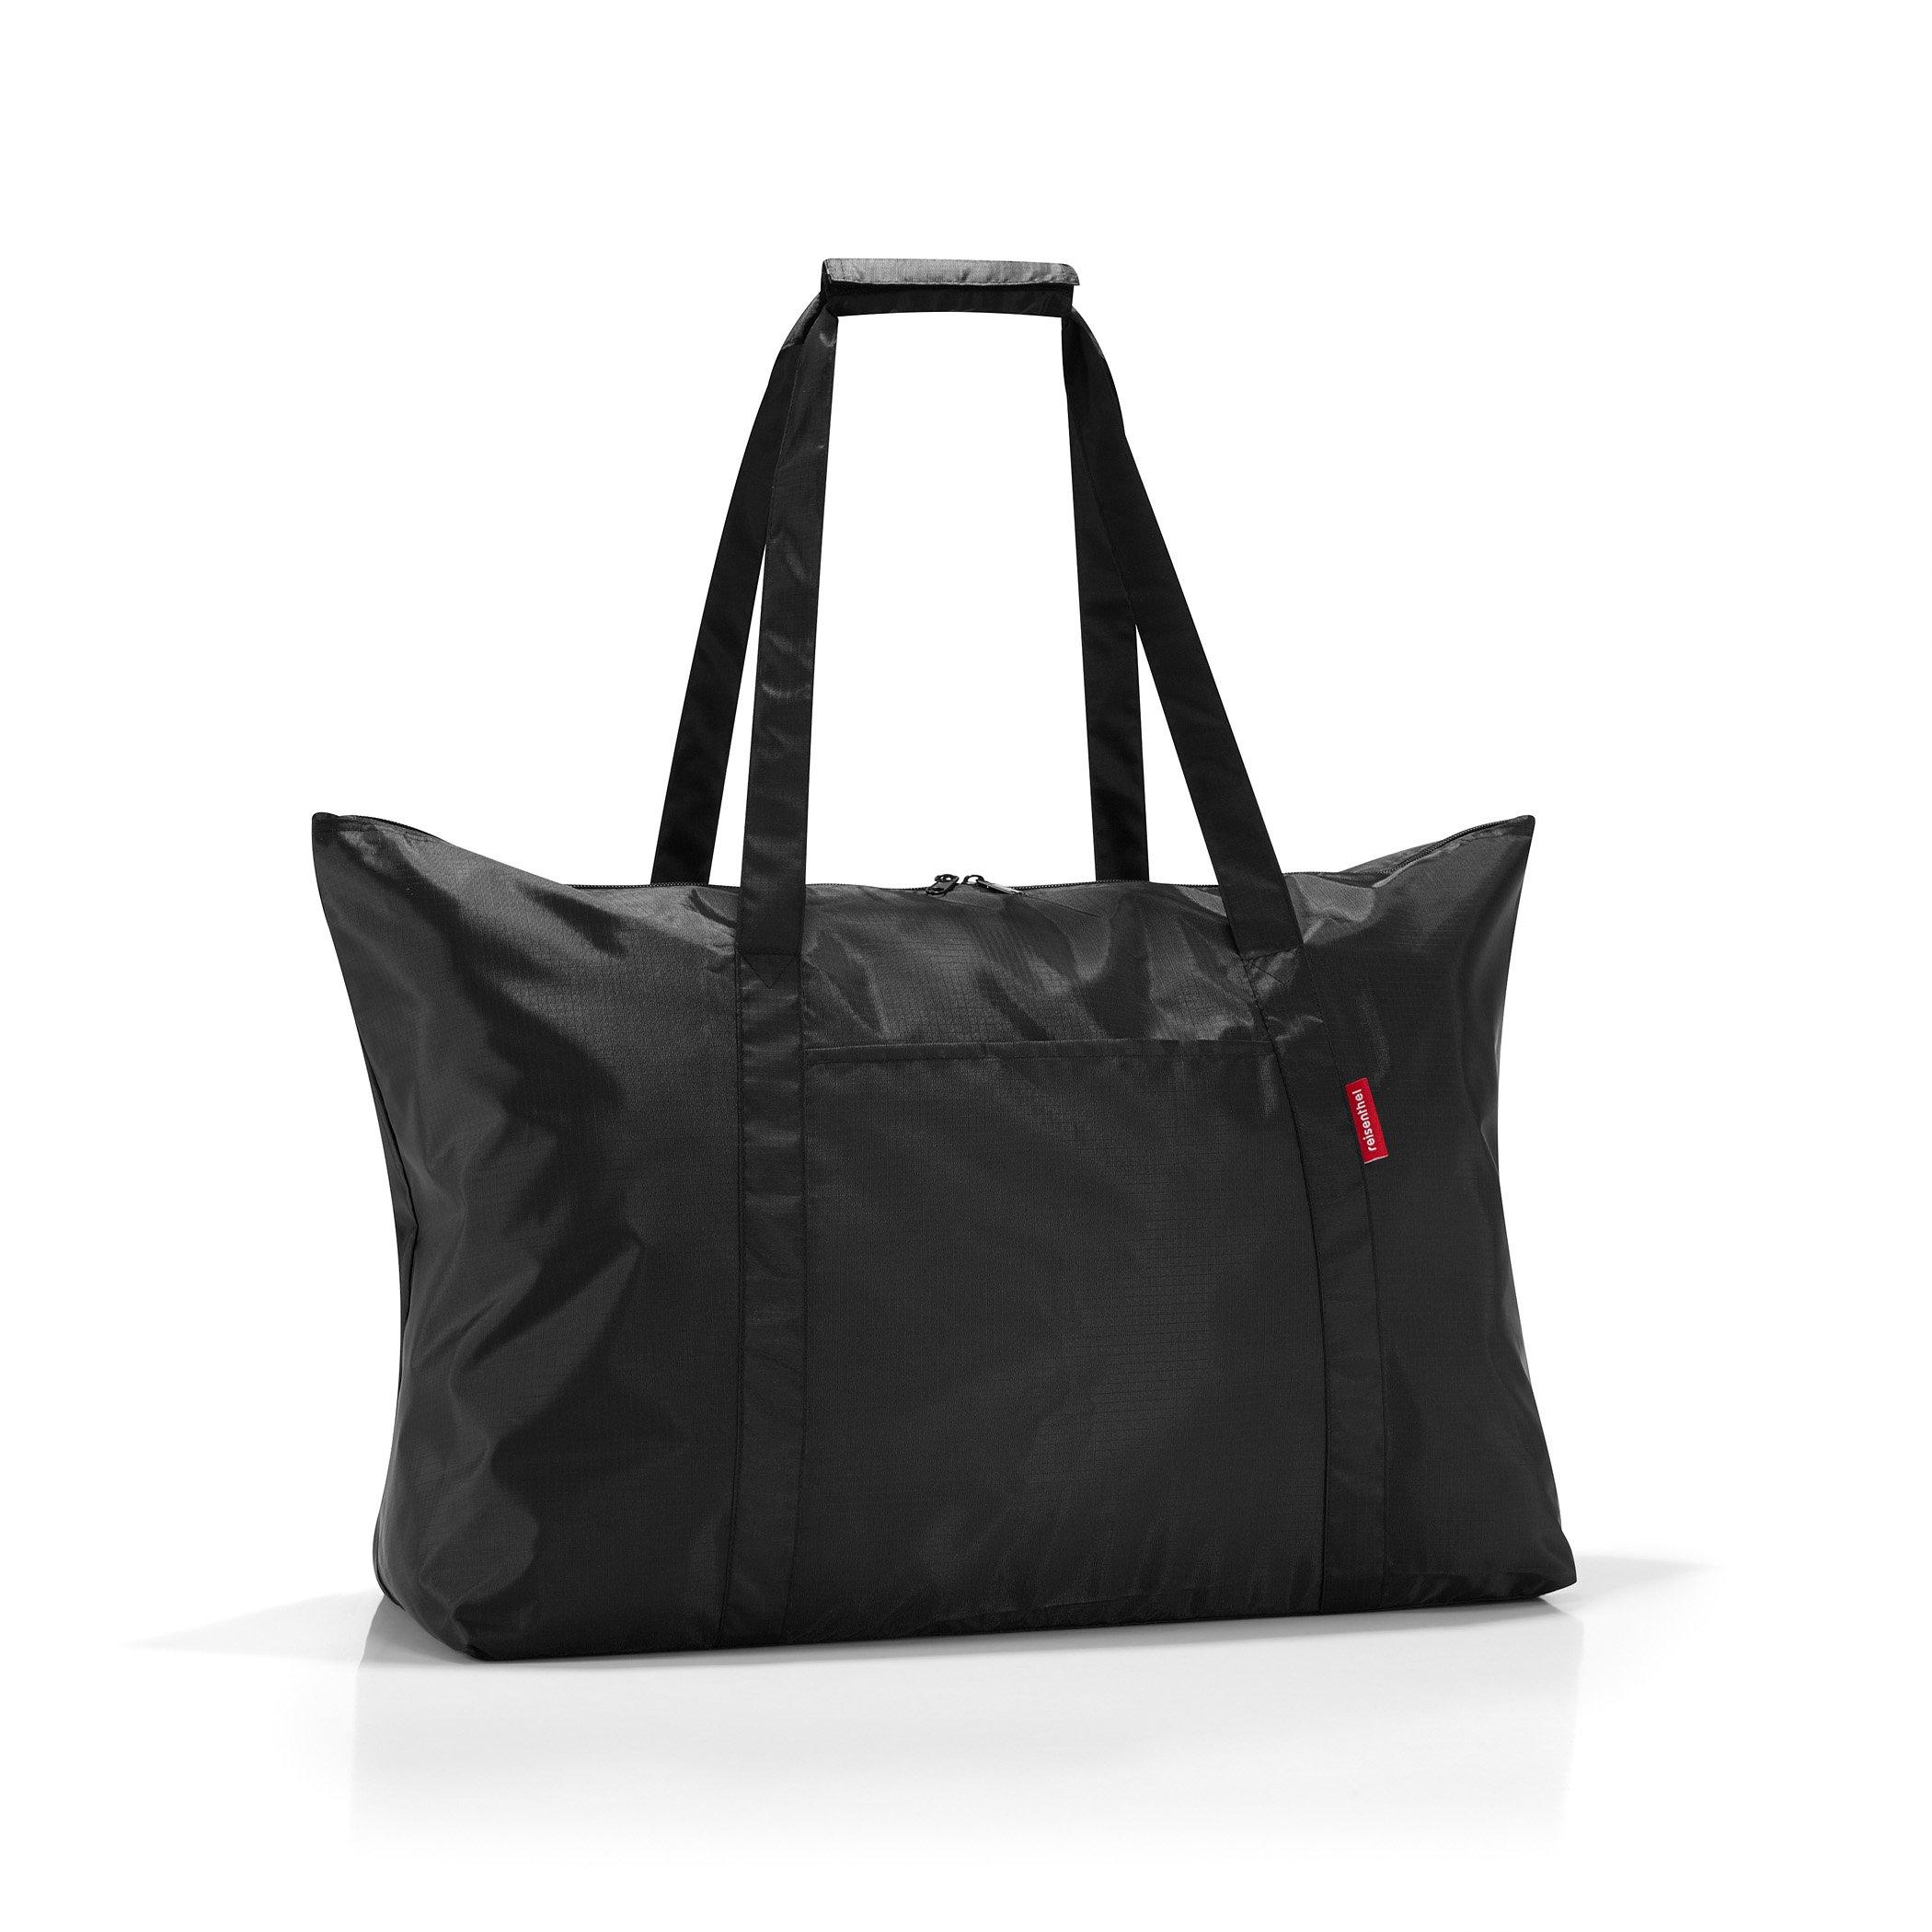 reisenthel Mini Maxi Travelbag, Foldable Tote with Compact Storage Bag, Black